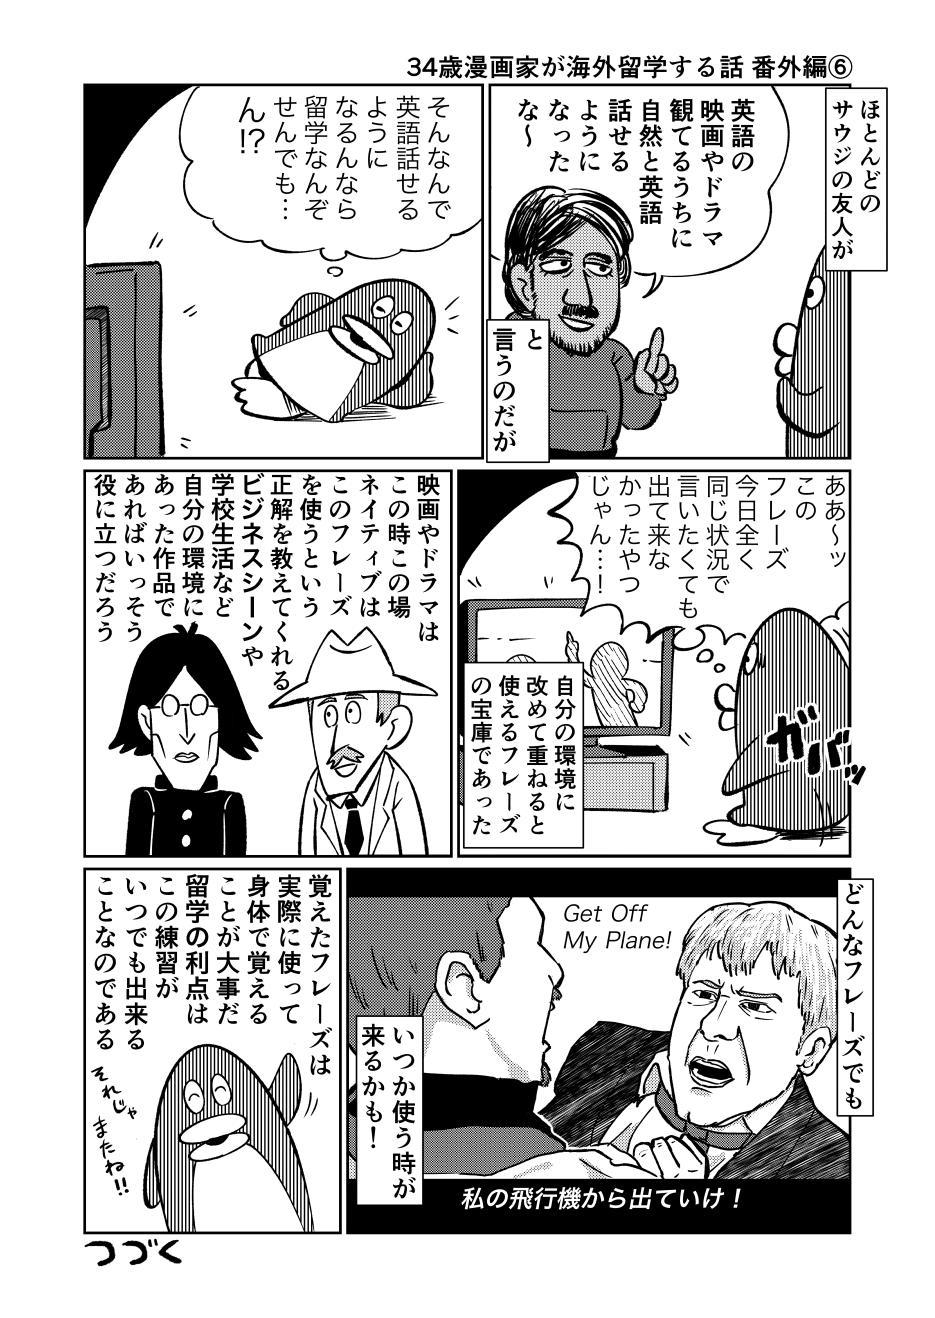 https://www.ryugaku.co.jp/blog/els_portland/upload/154d44f013fc7ee8786422f087692b2cb211136a.jpg